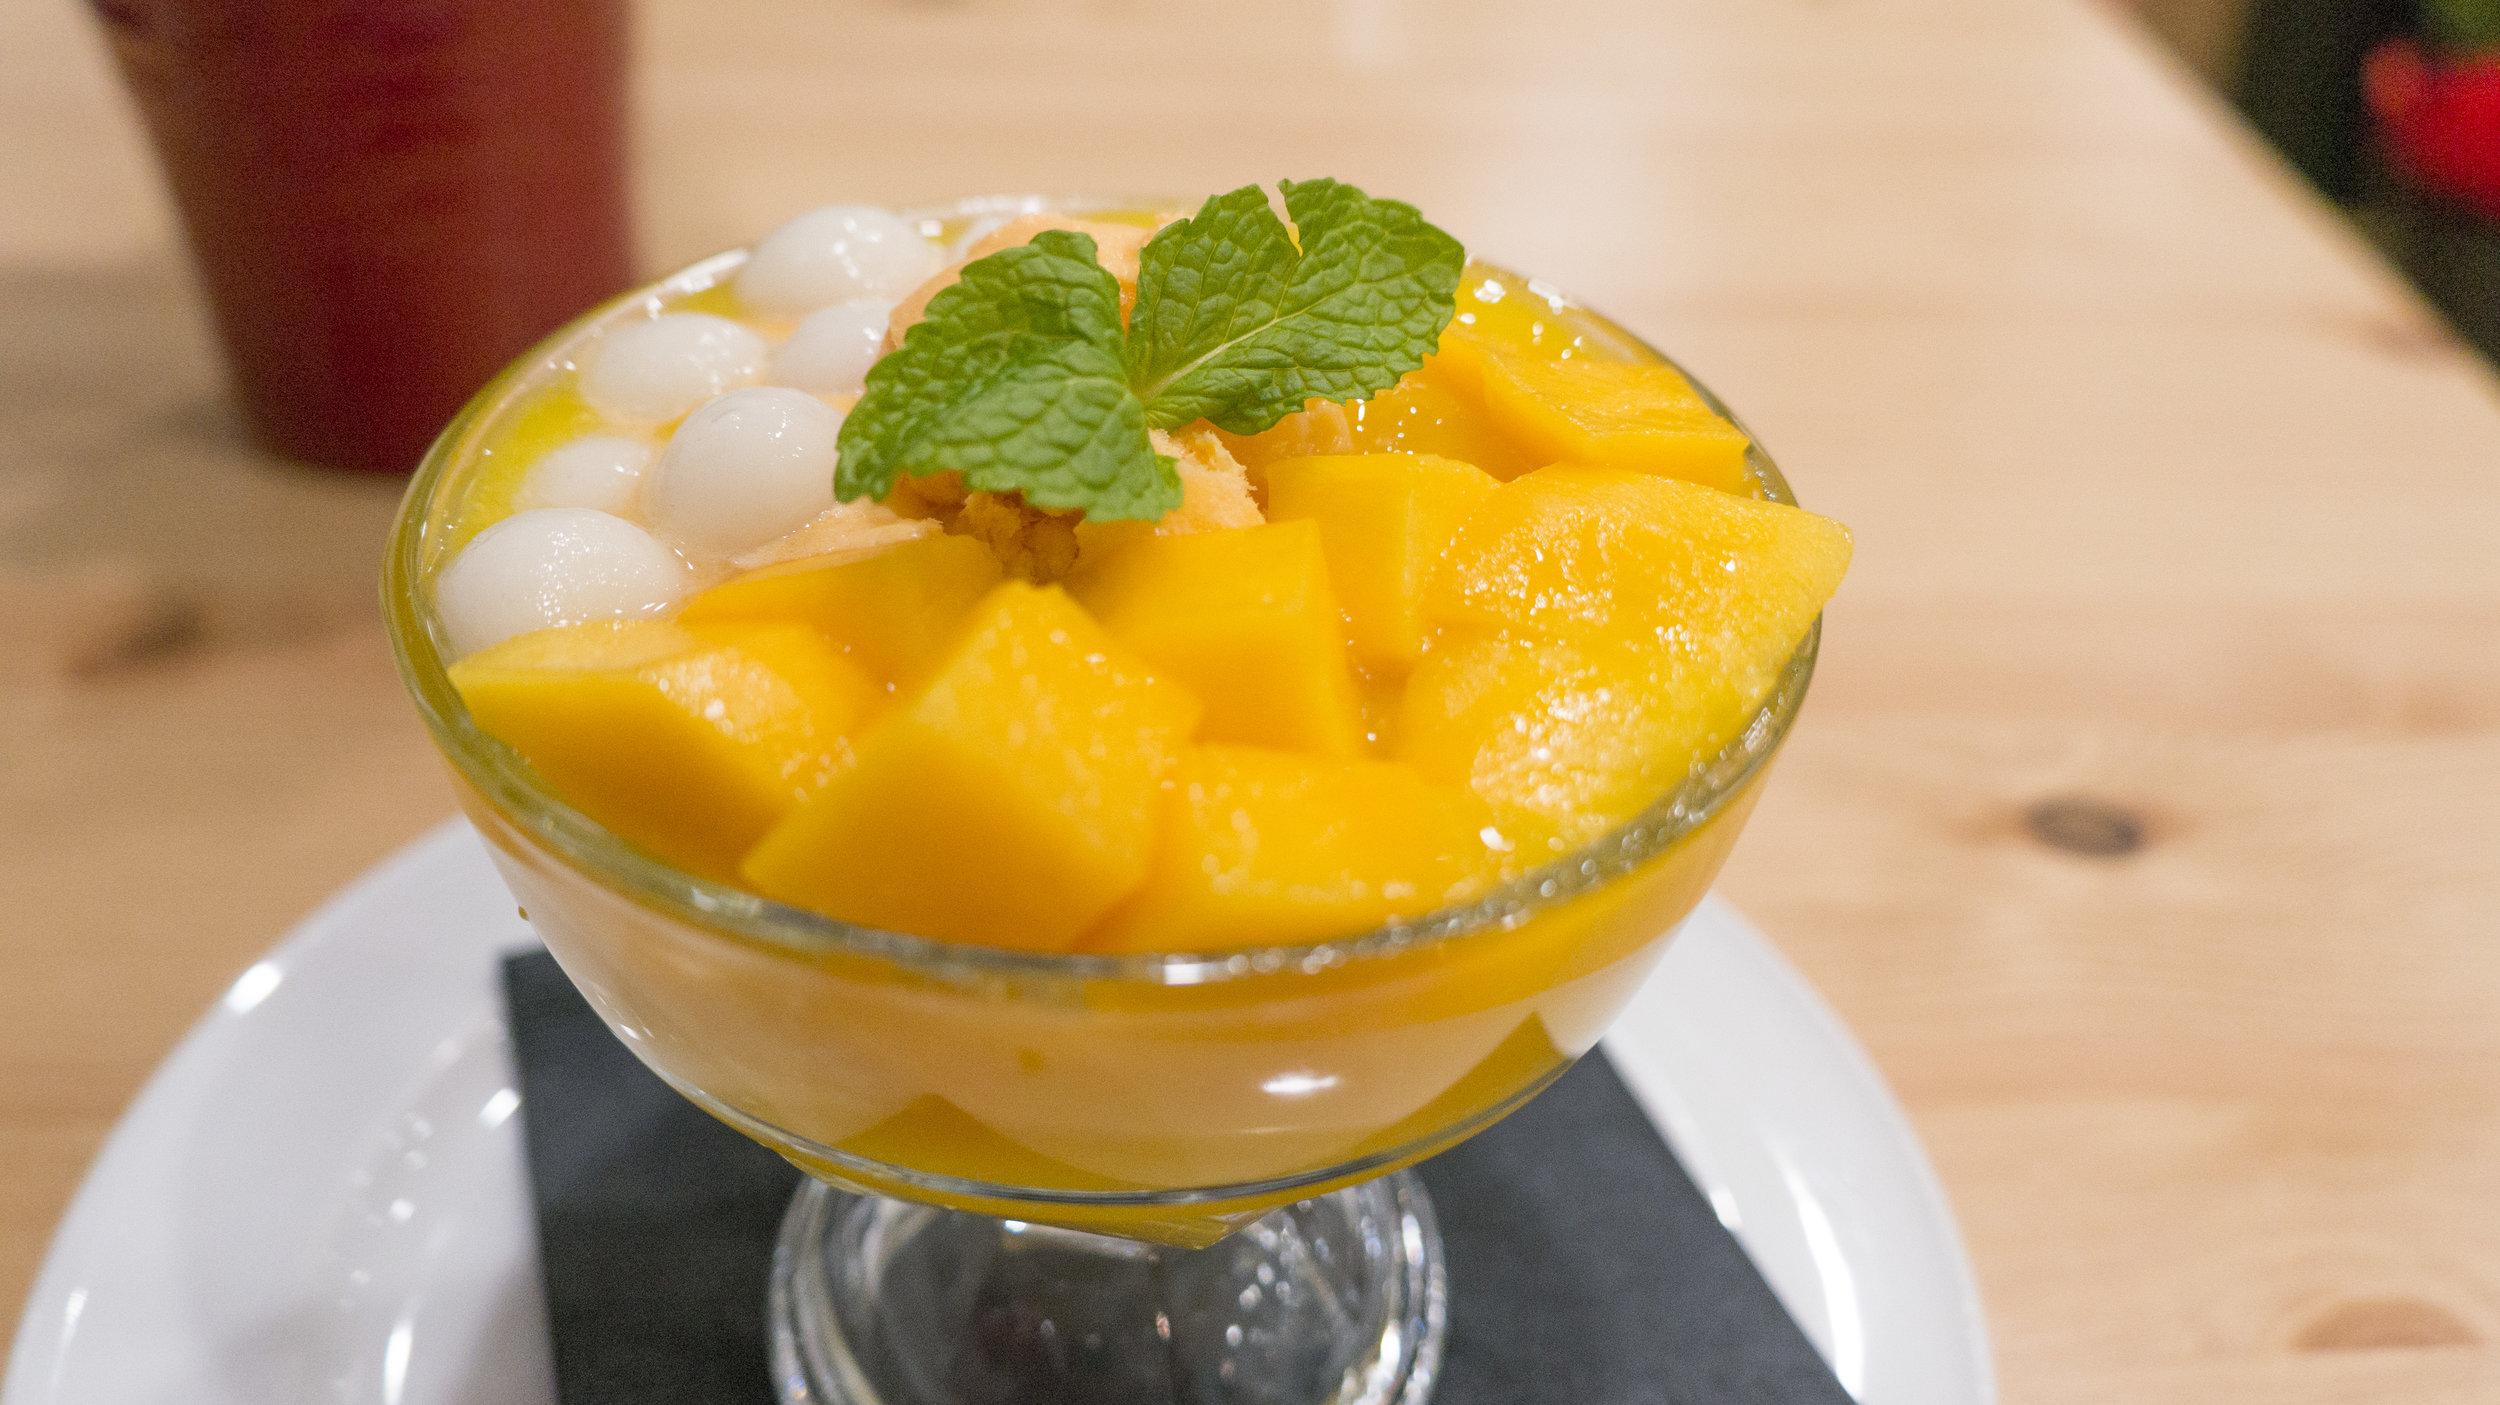 Fresh Mango, Mango Puree, Sago, Rice Ball, and Mango Ice Cream | $9.5